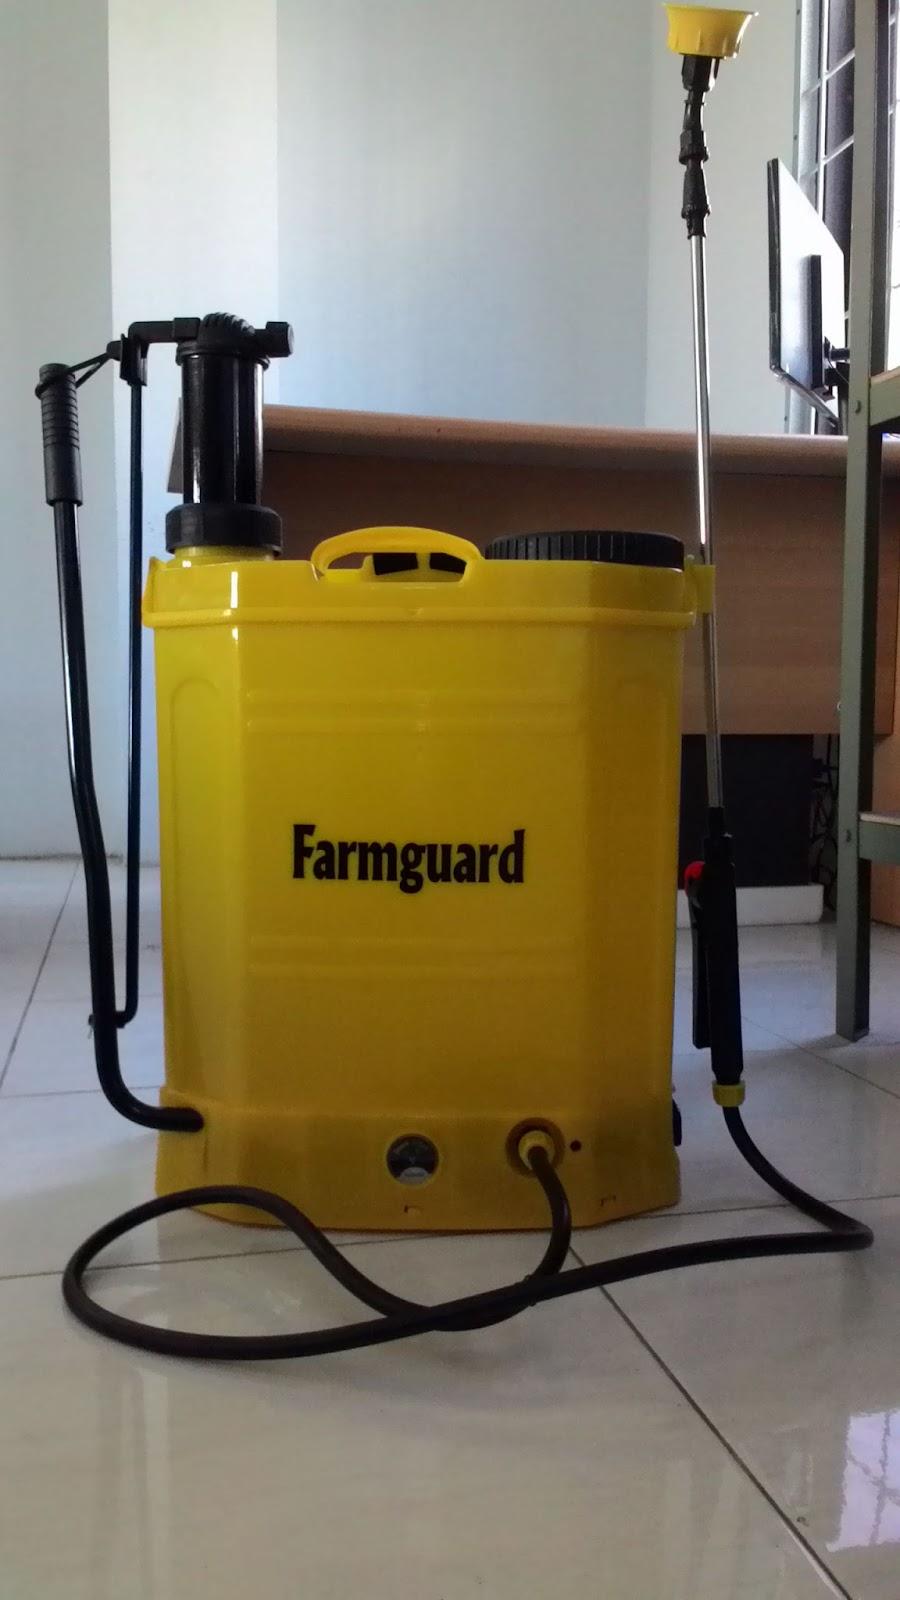 Saam Manual Alat Tanam Jagung Gfs 02 Electric Sprayer Battery Se Santoso